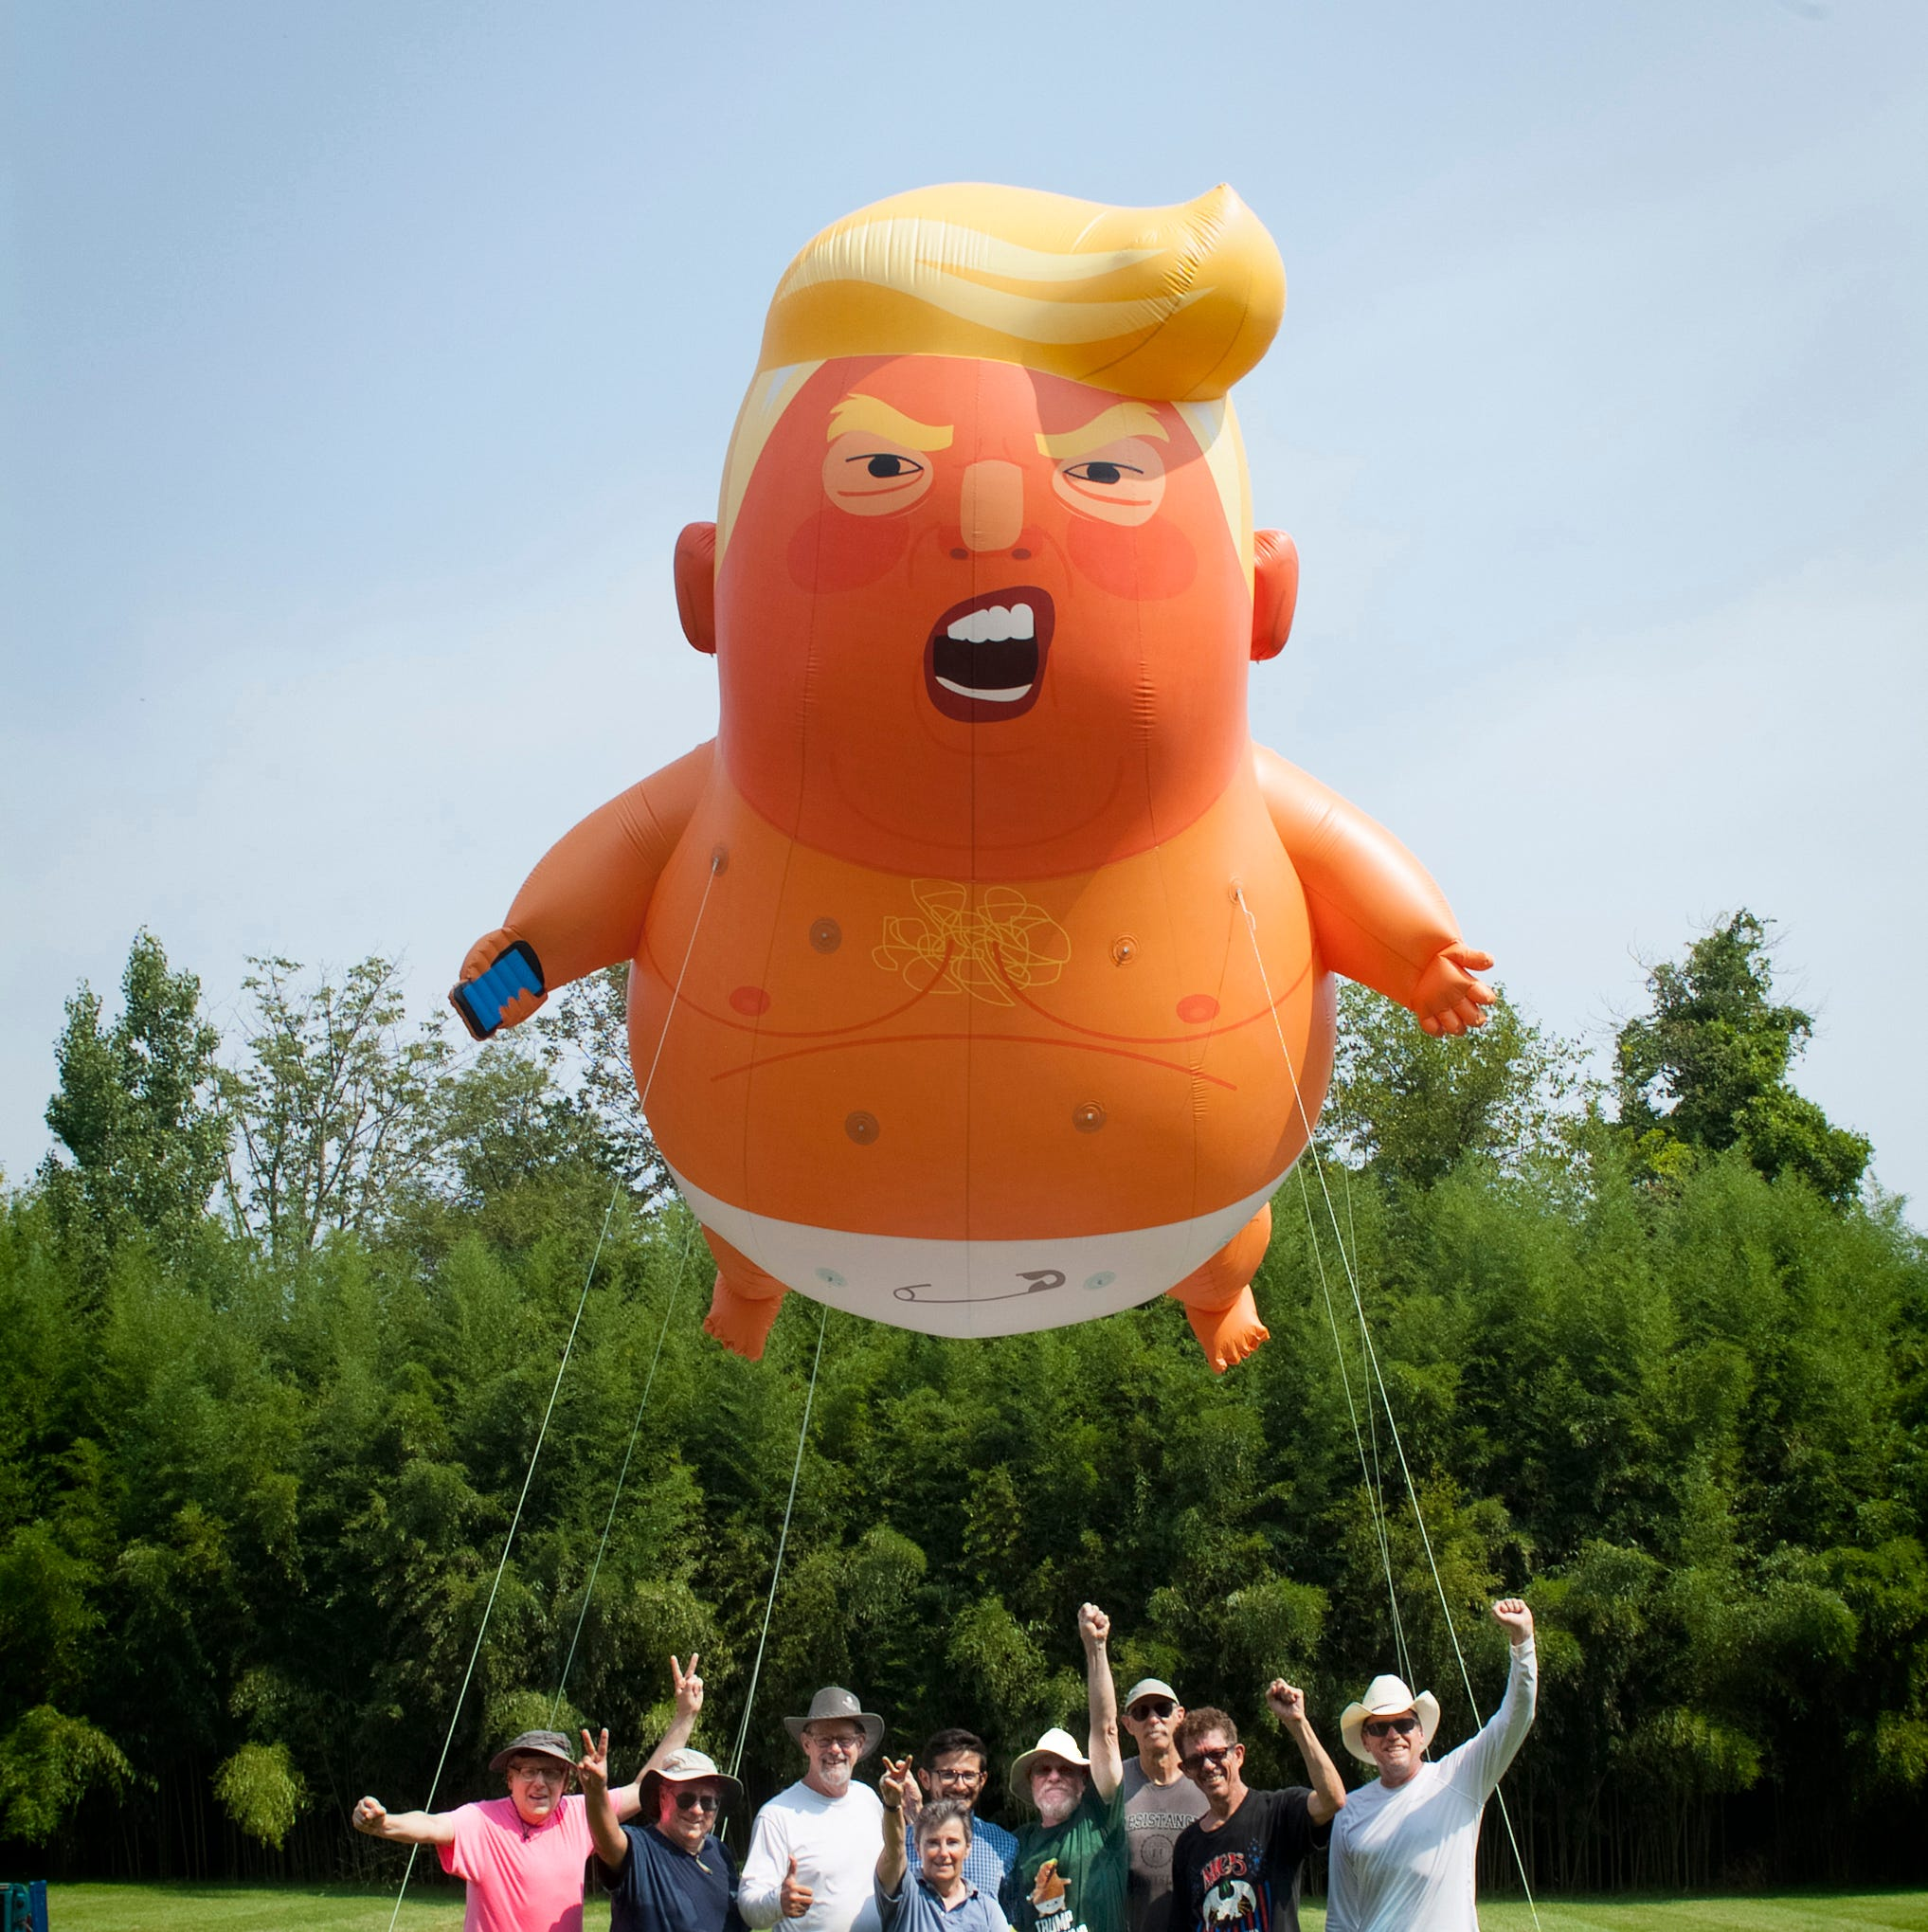 The first Baby Trump balloon has taken flight in NJ.